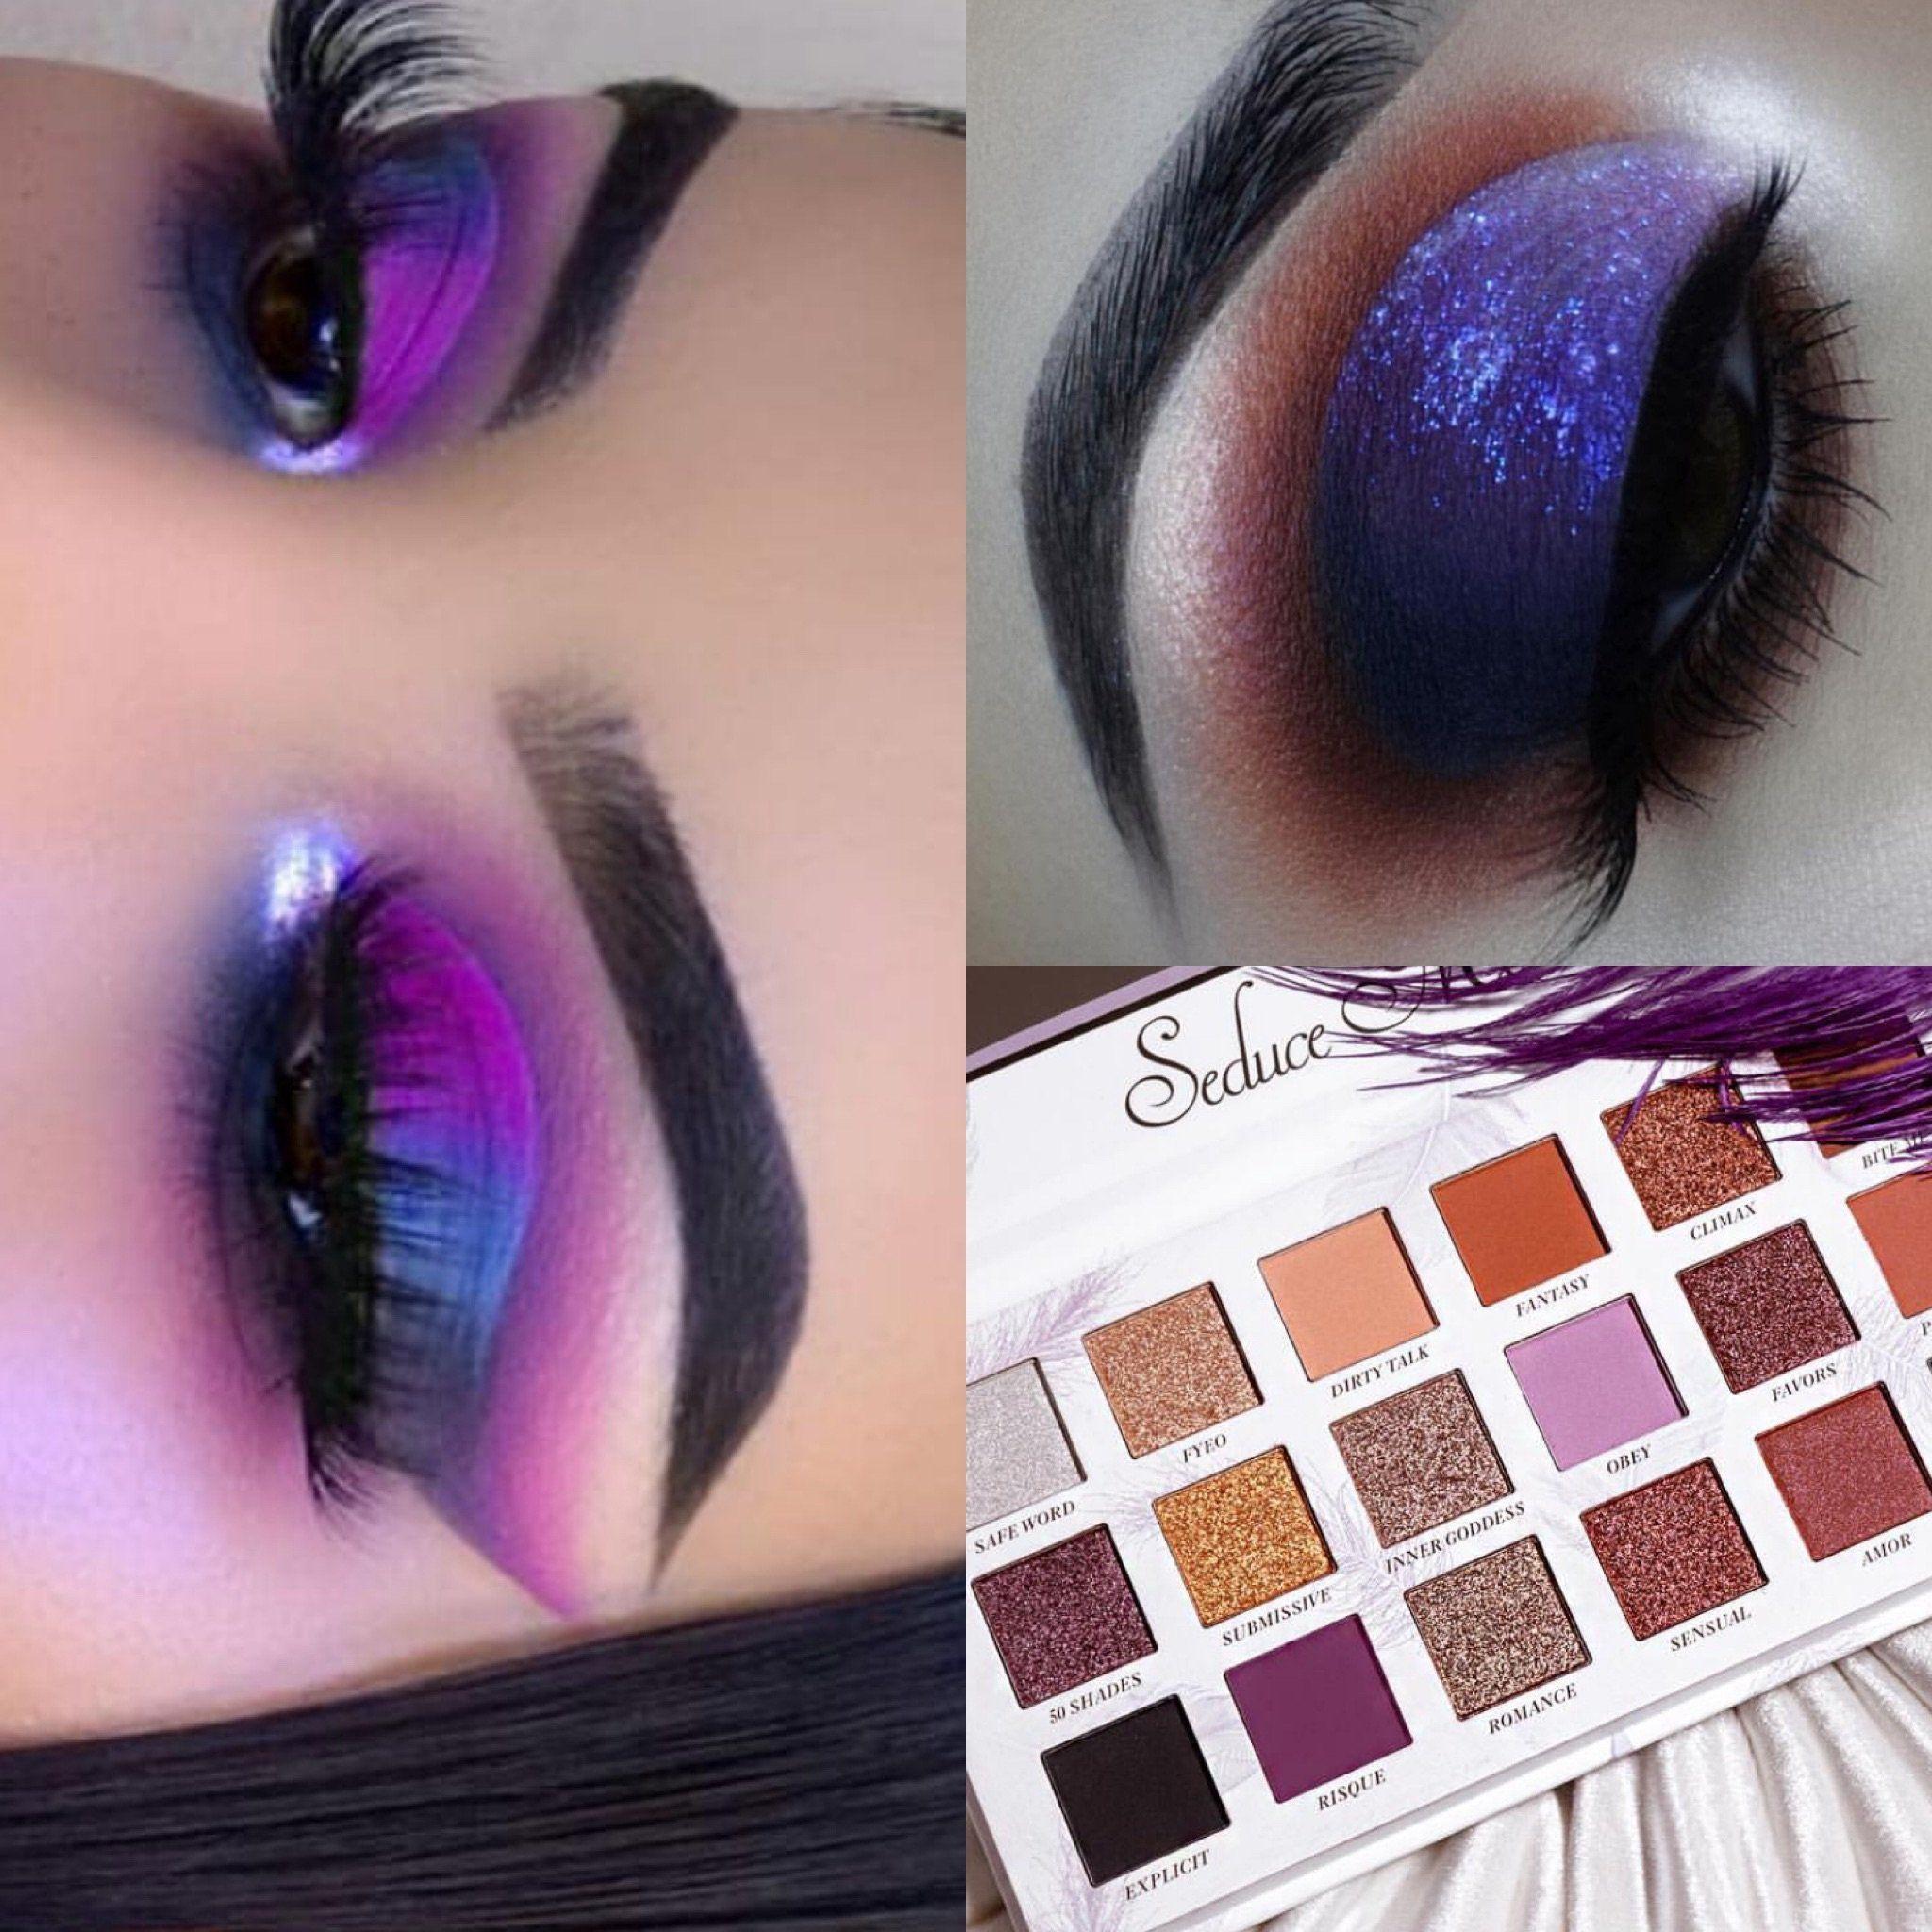 Seduce Me Beauty Creations Eyeshadow Palette Beauty Creations Eyeshadow Palette Eye Makeup